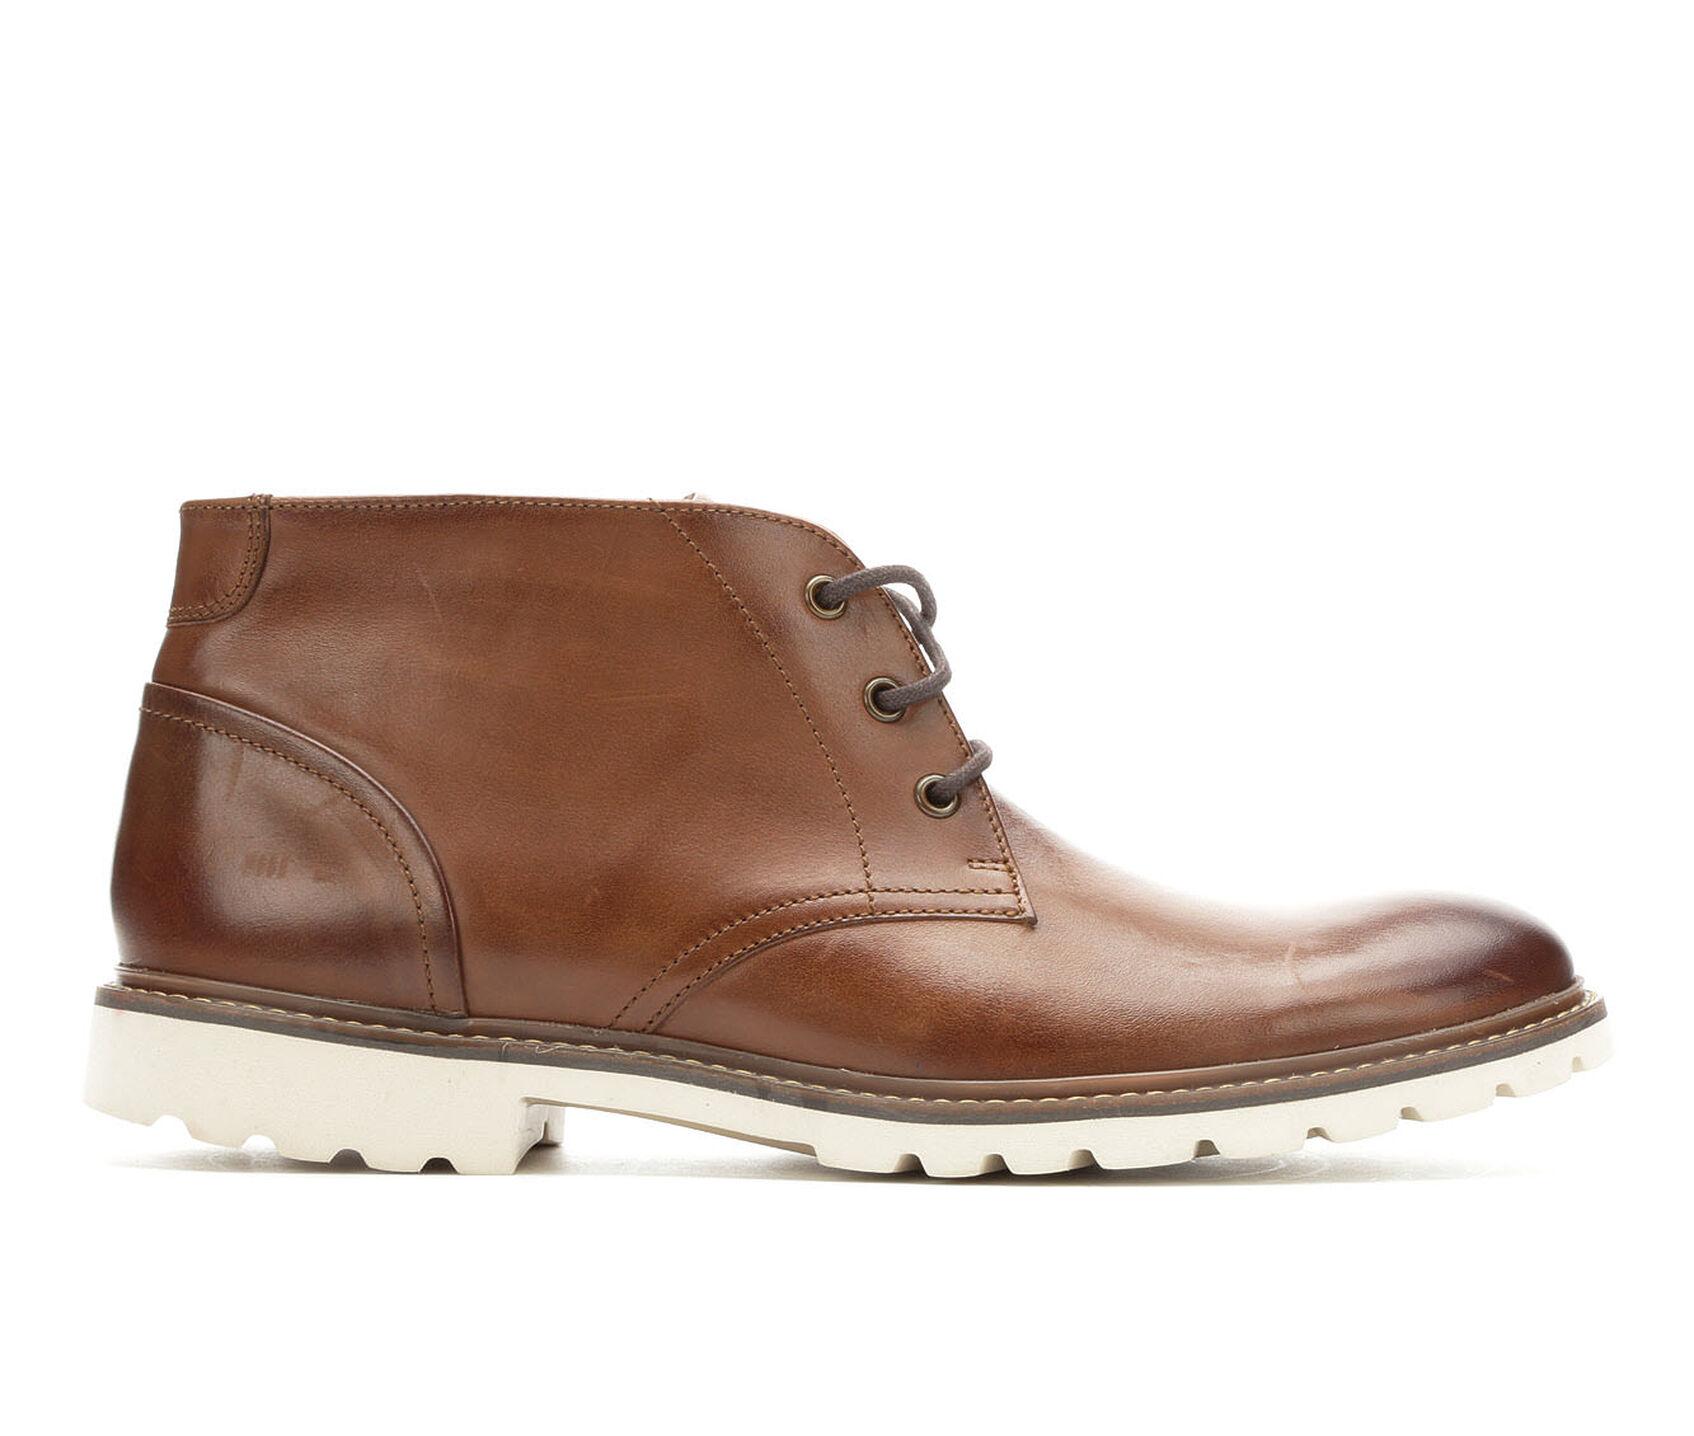 fa4d2077d29 Men's Rockport Sharp & Ready Chukka Boots